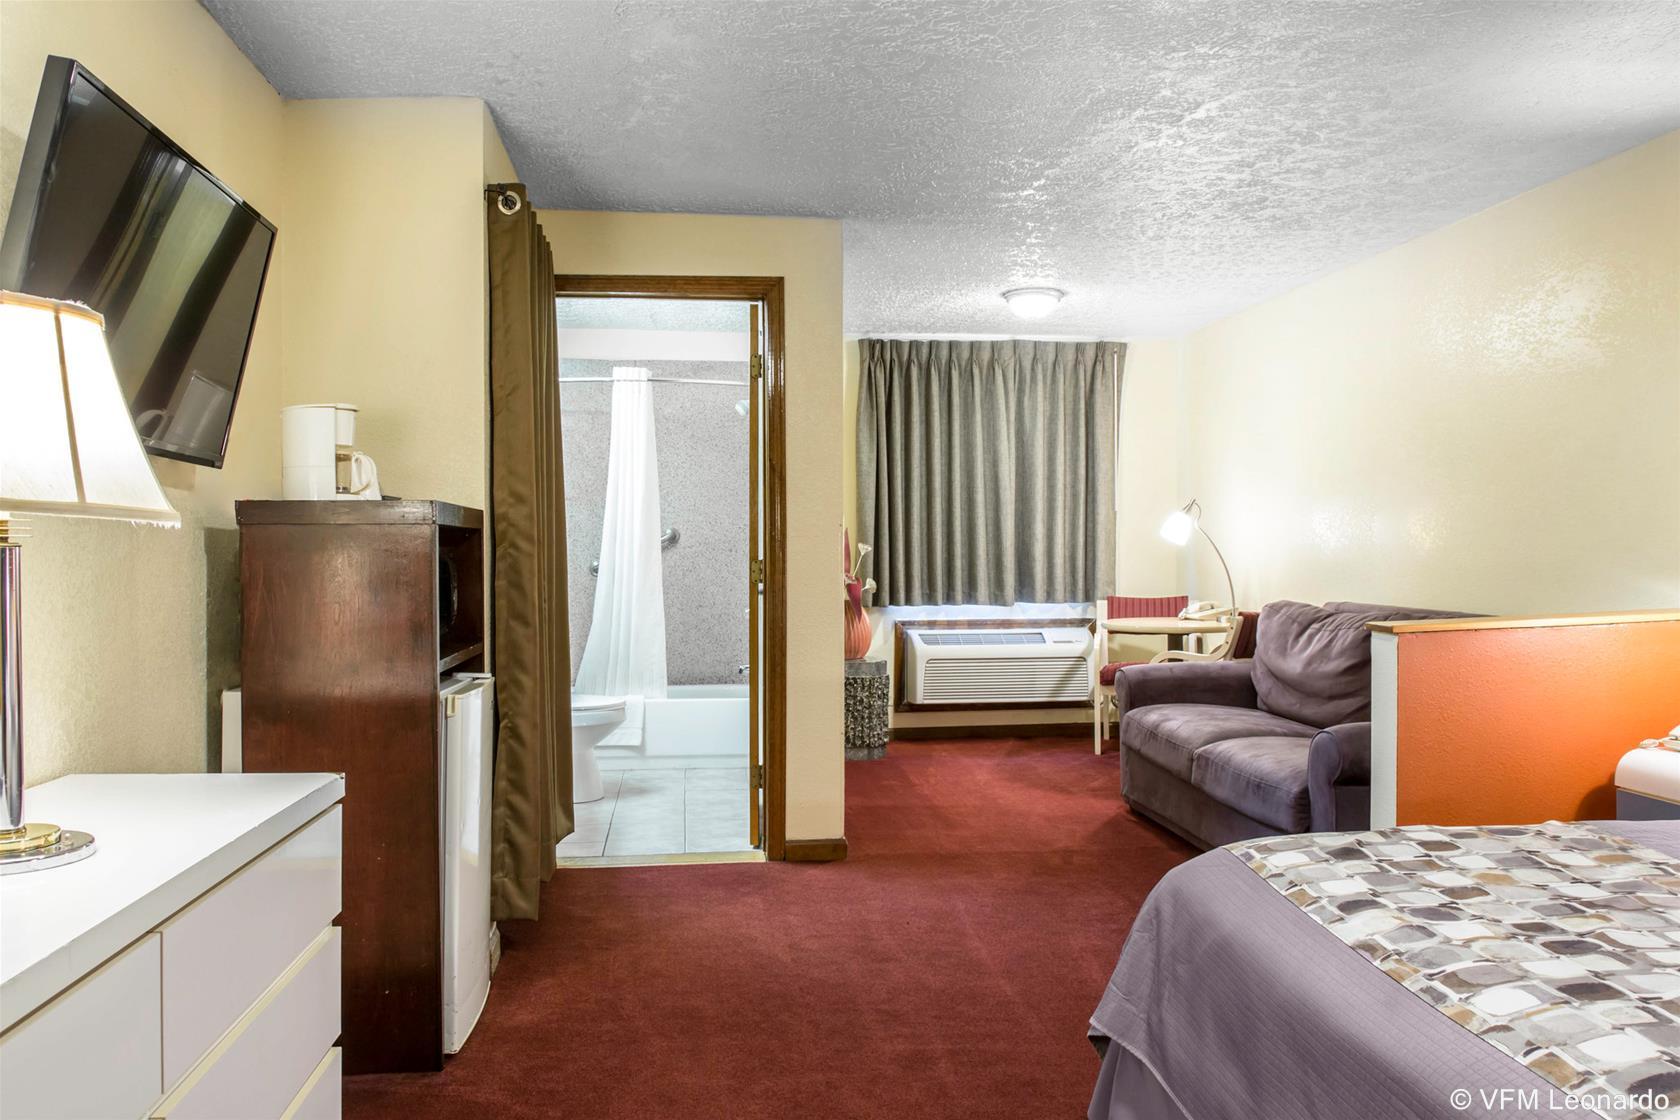 Rodeway Inn & Suites Branford - Guilford, New Haven